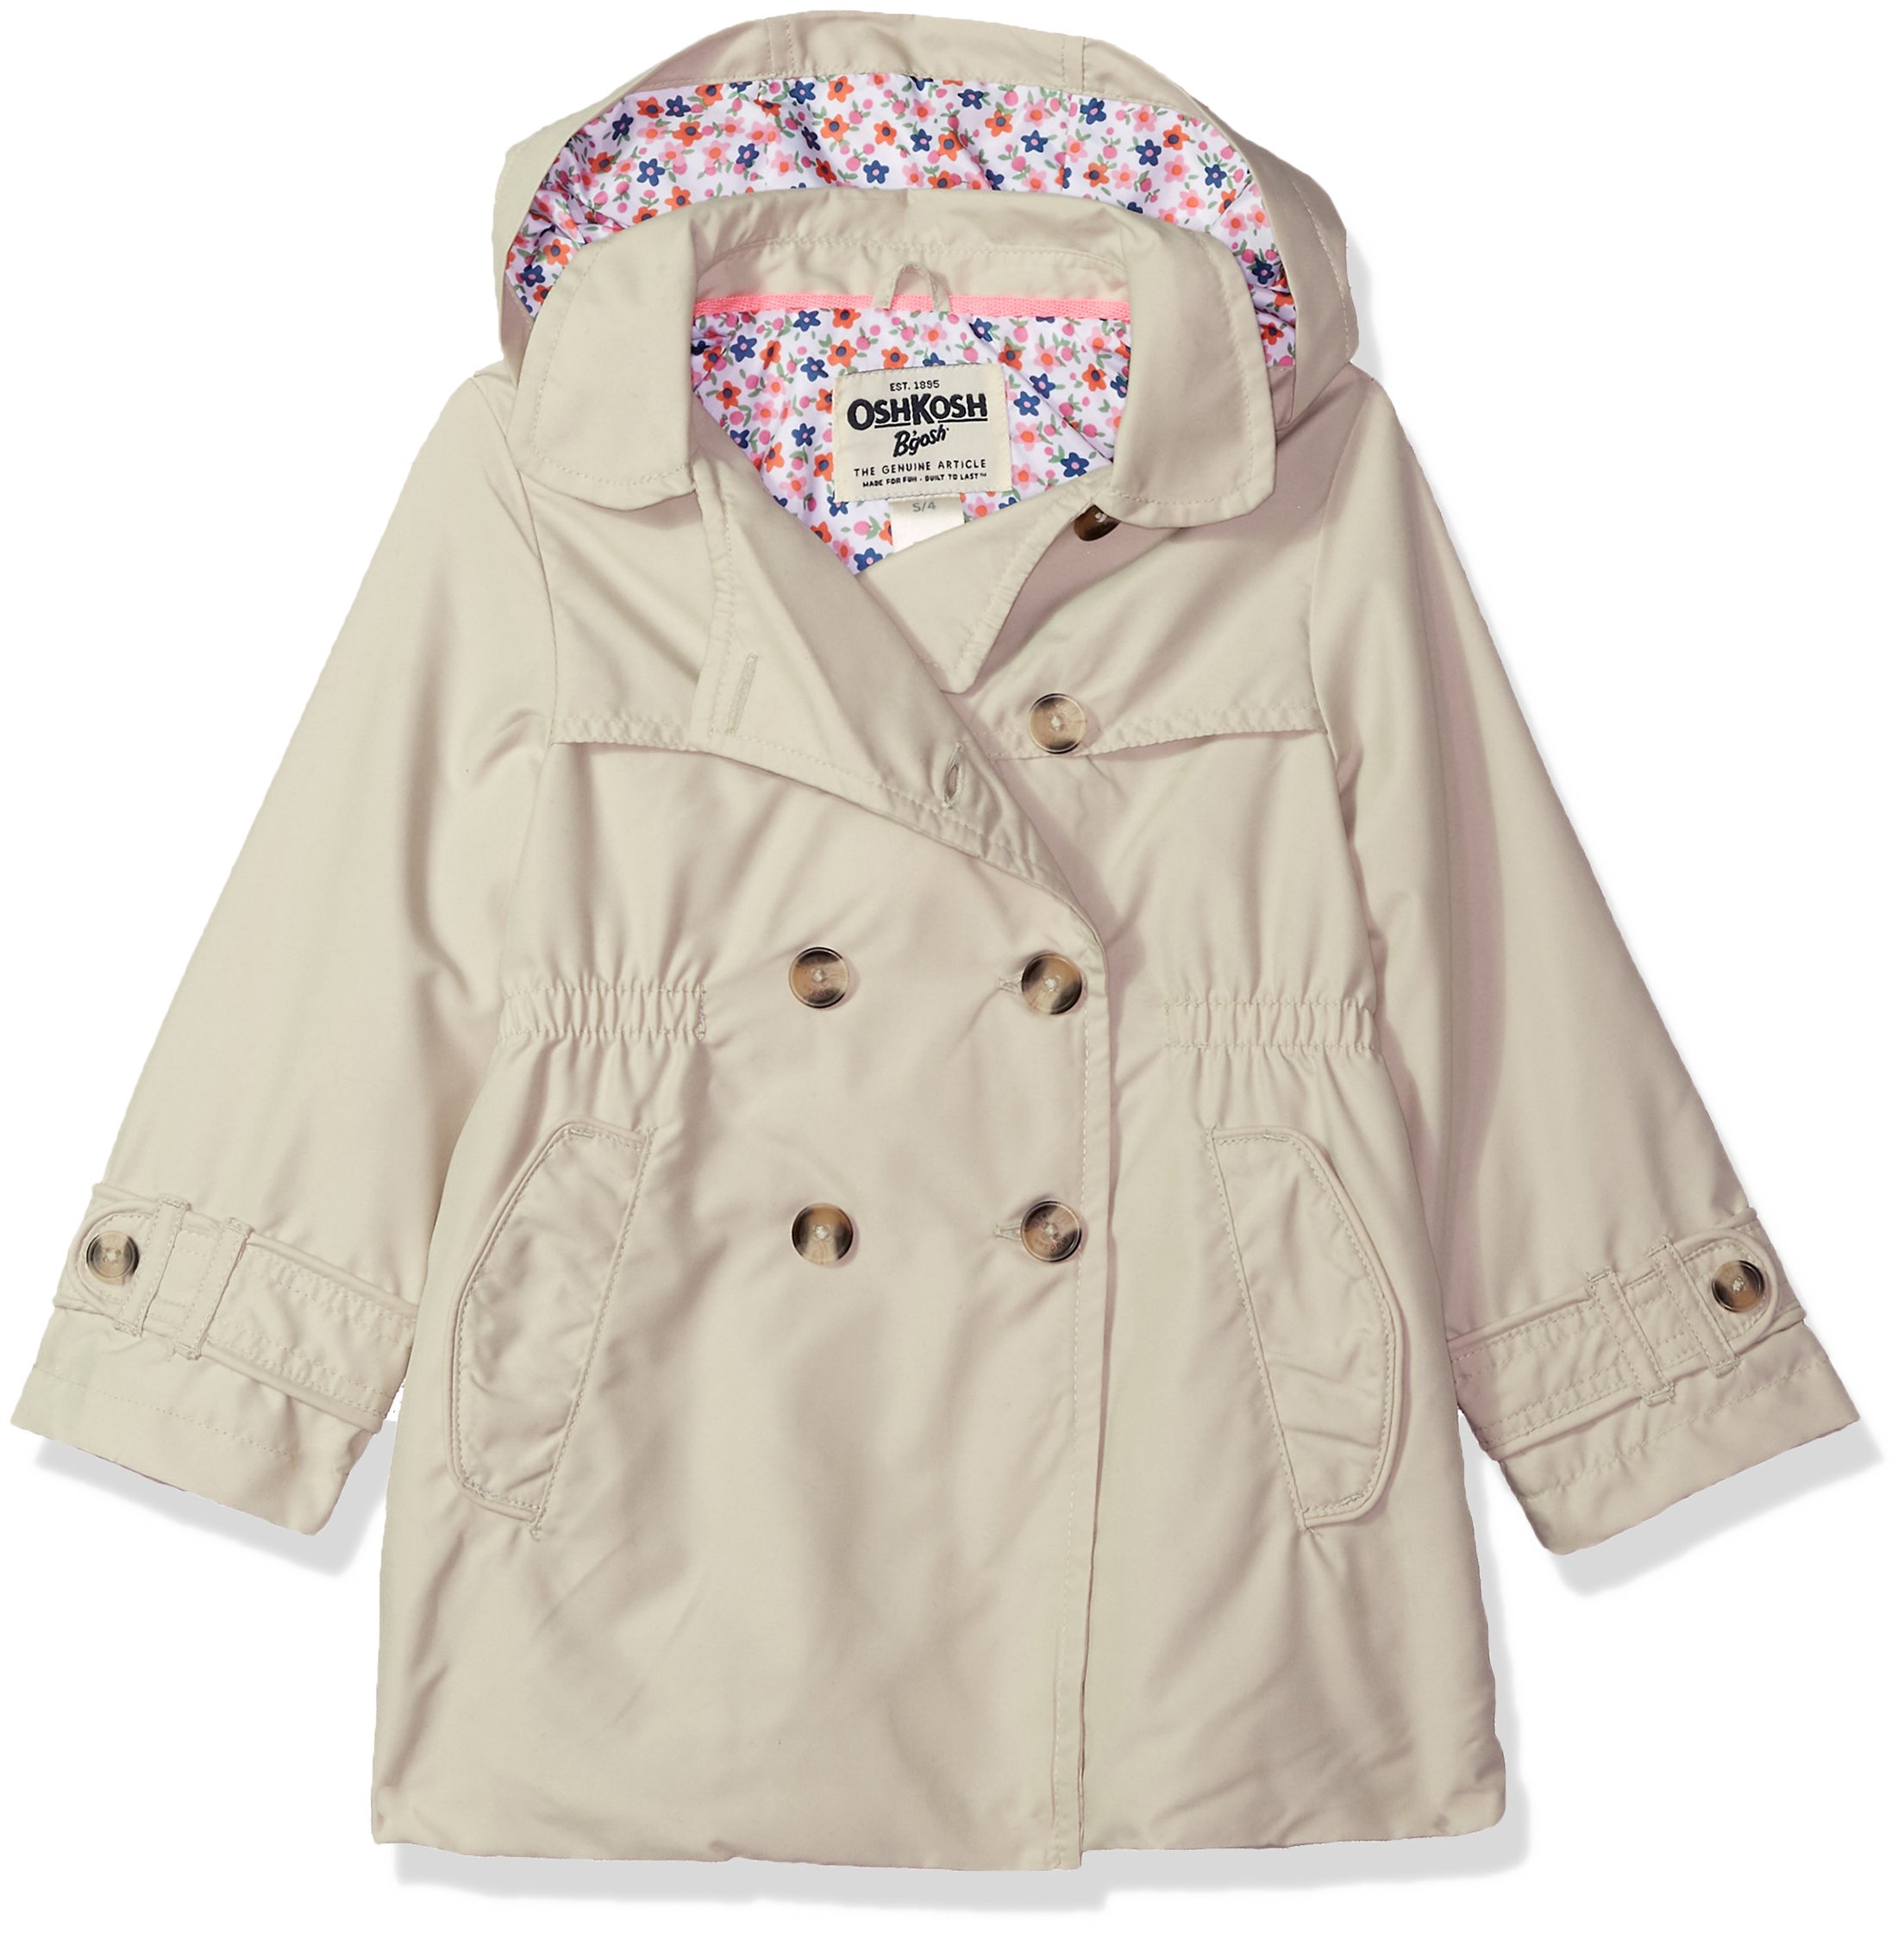 OshKosh B'Gosh Osh Kosh Toddler Girls' Hooded Trench Coat, Khaki Pebble, 3T